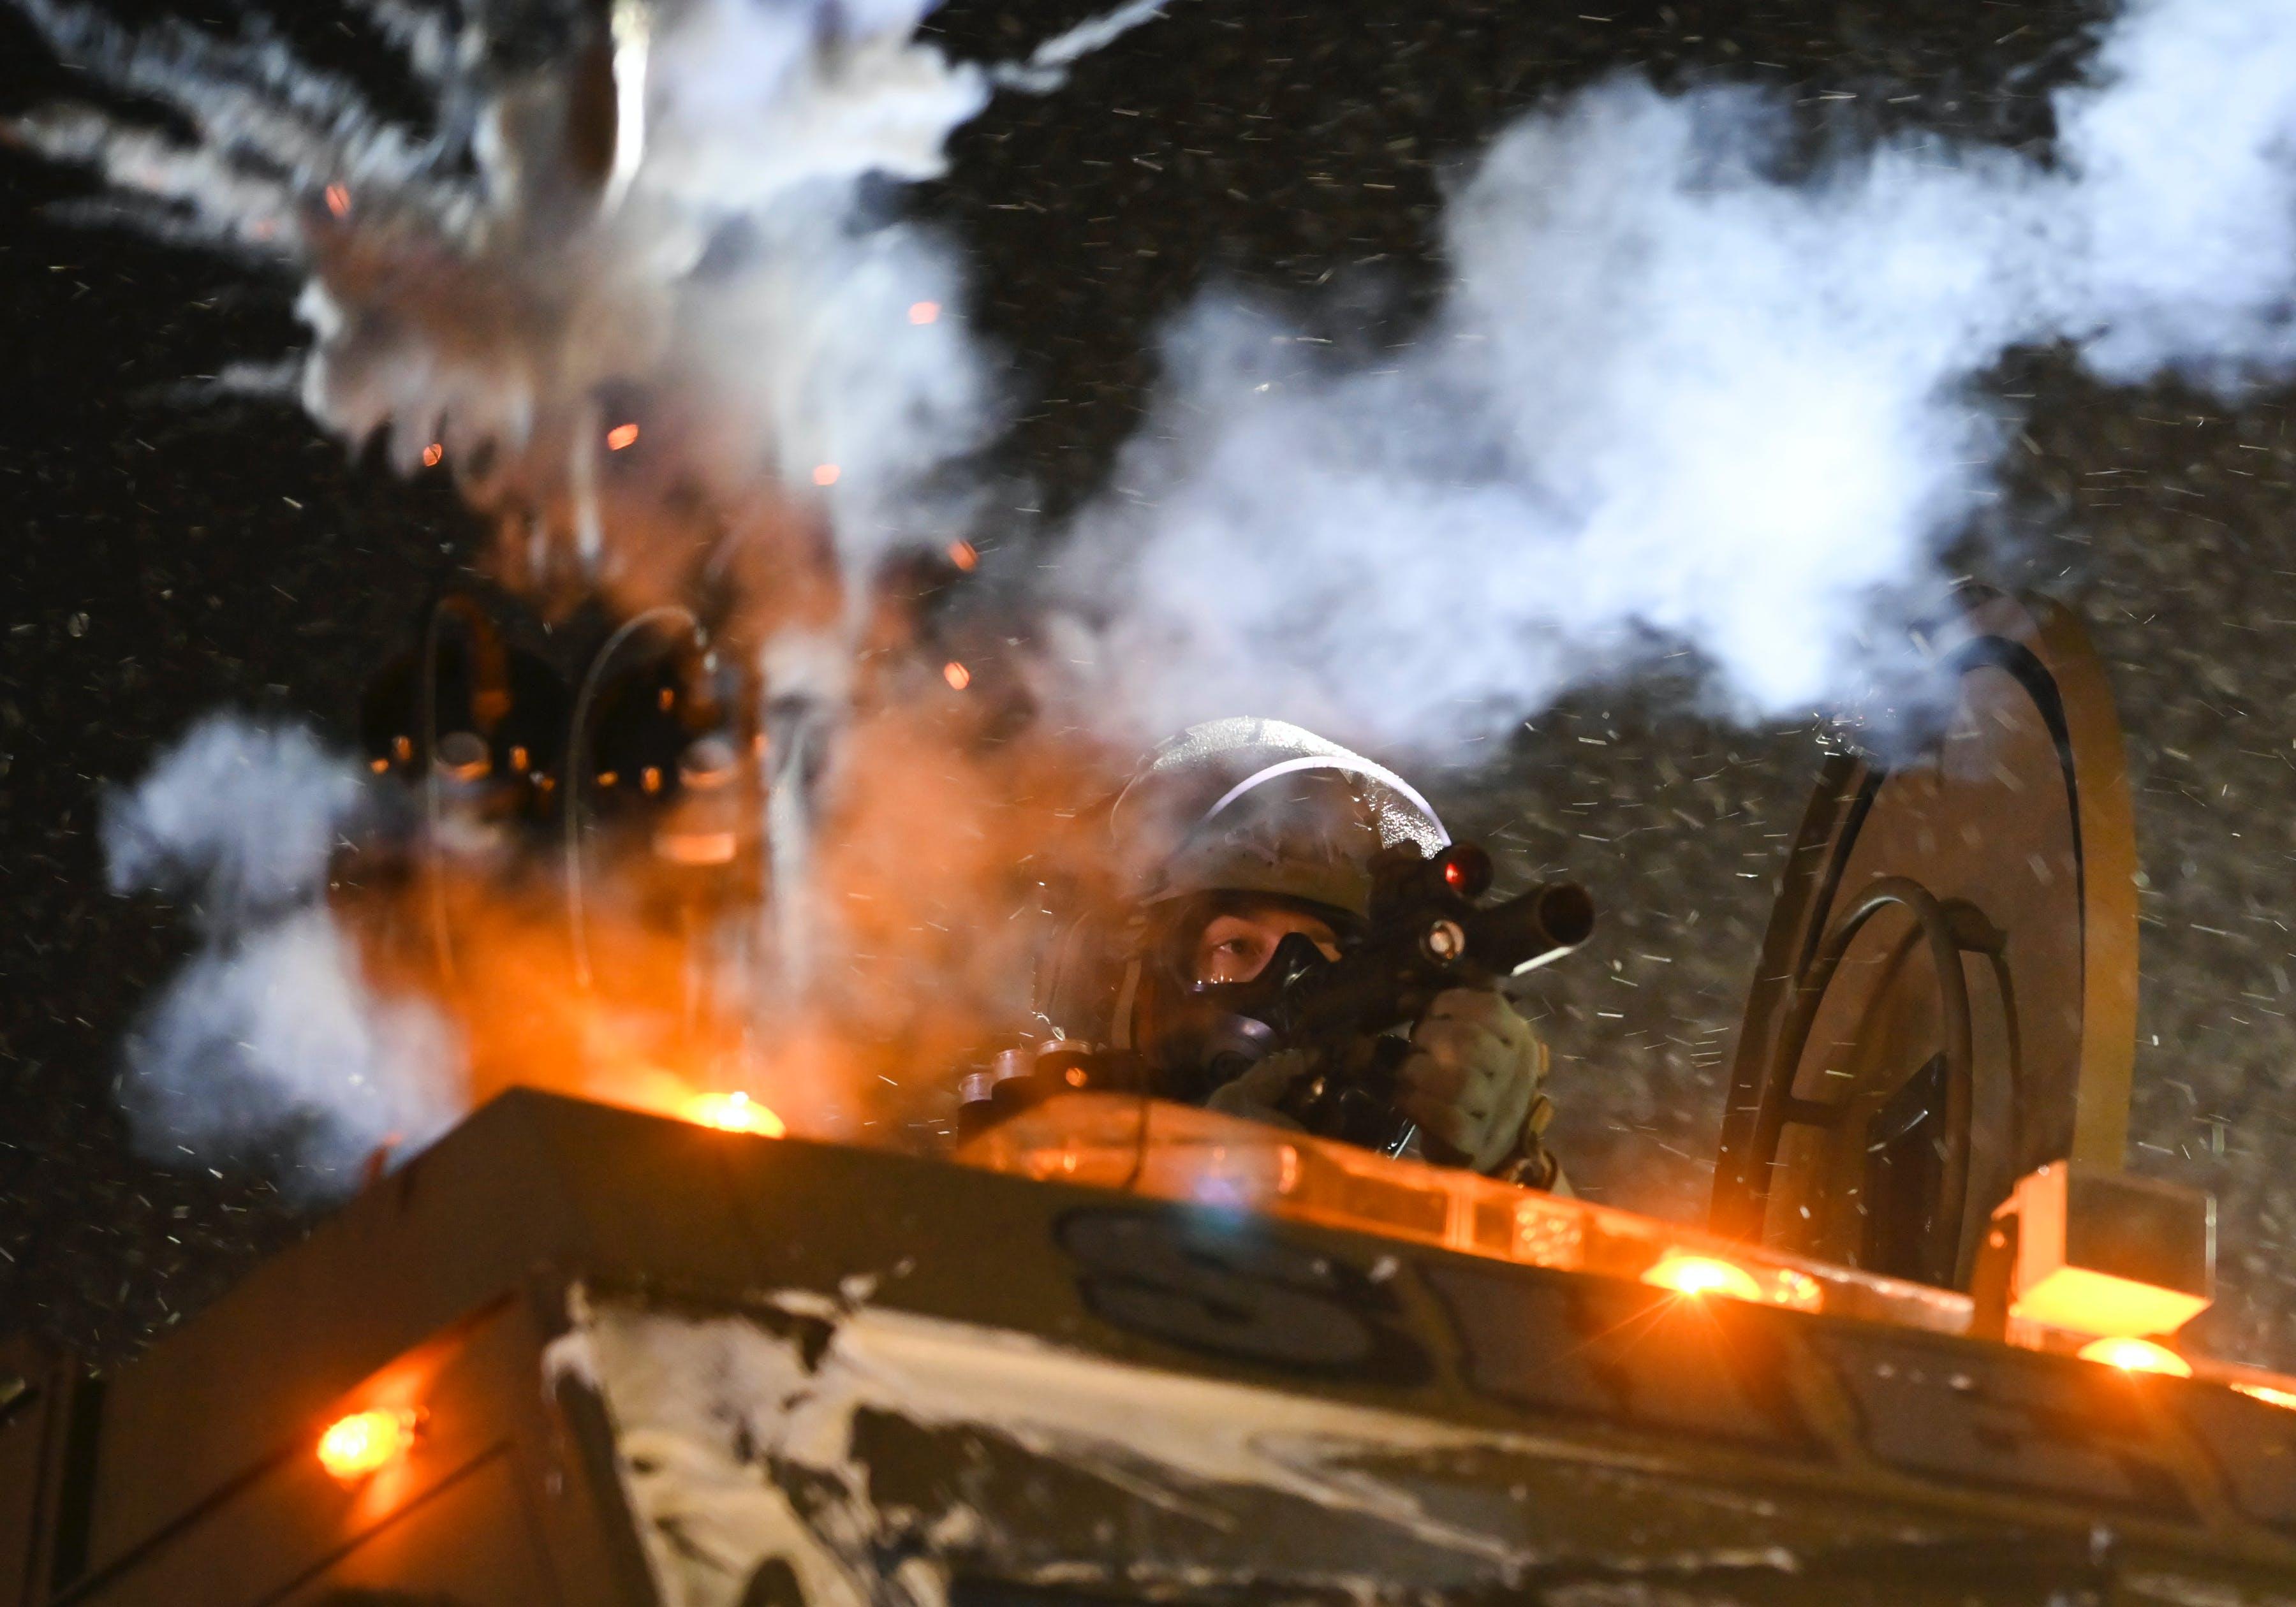 Tensions build between Walz, progressives over police protests